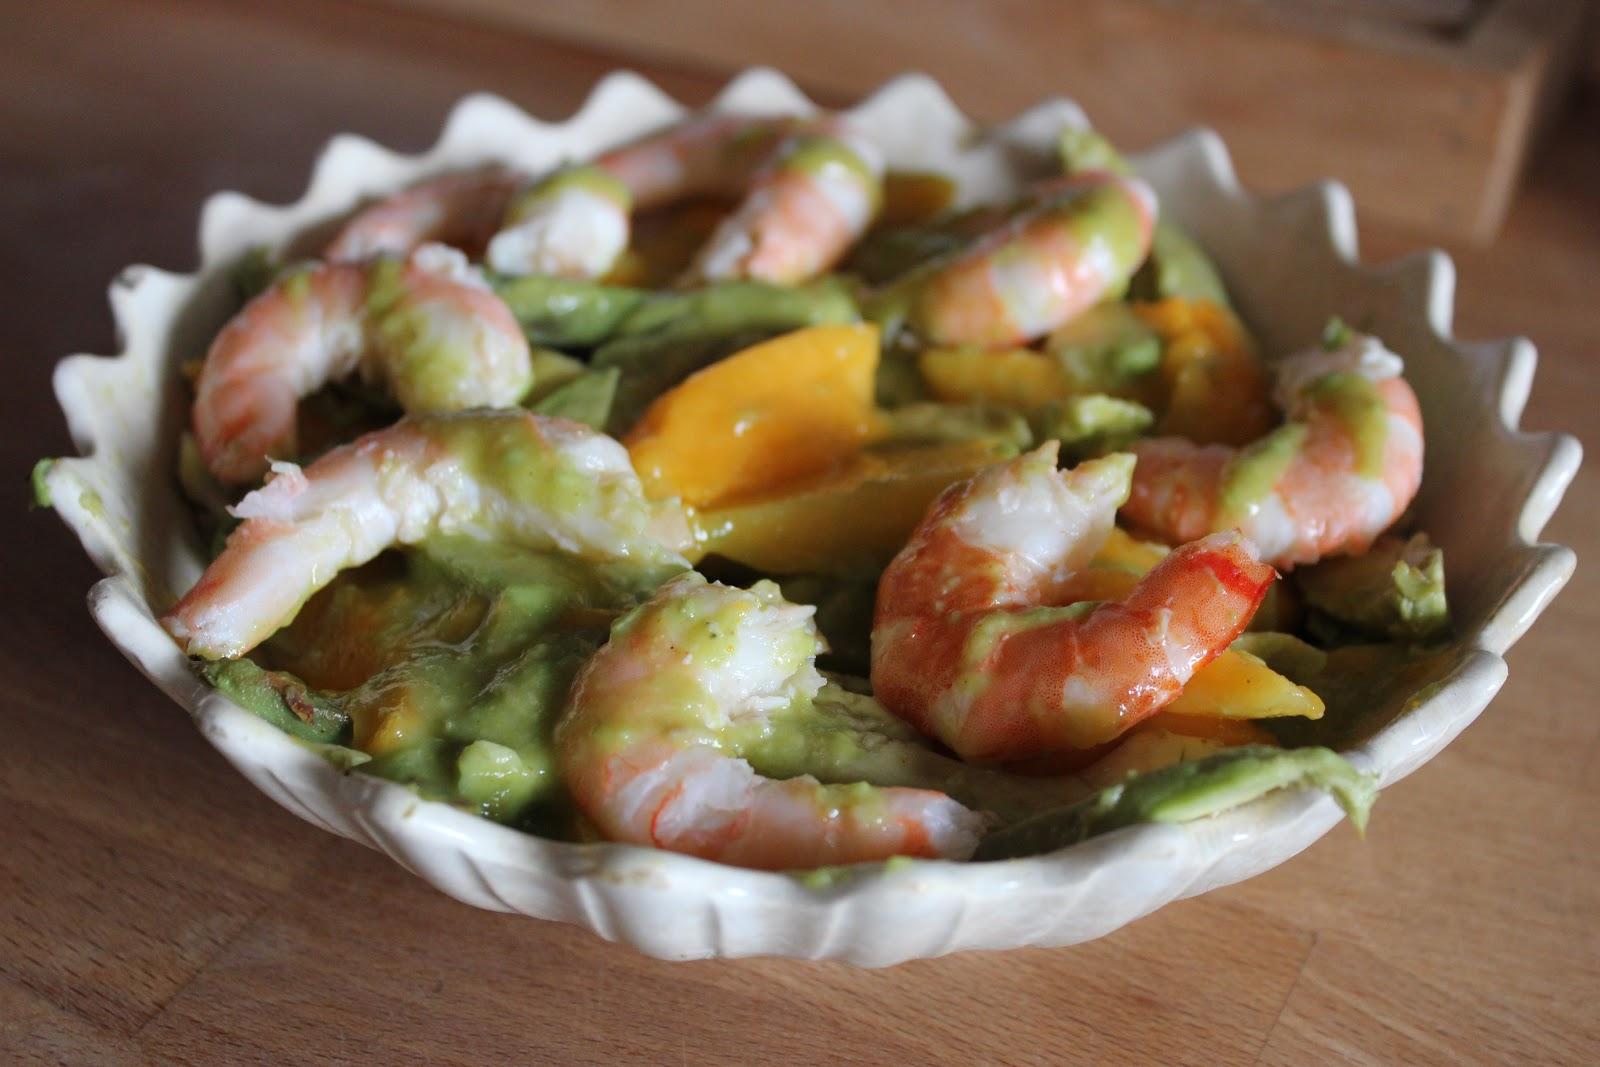 https://cuillereetsaladier.blogspot.com/2013/03/salade-avocat-mangue-crevettes-et-sa.html